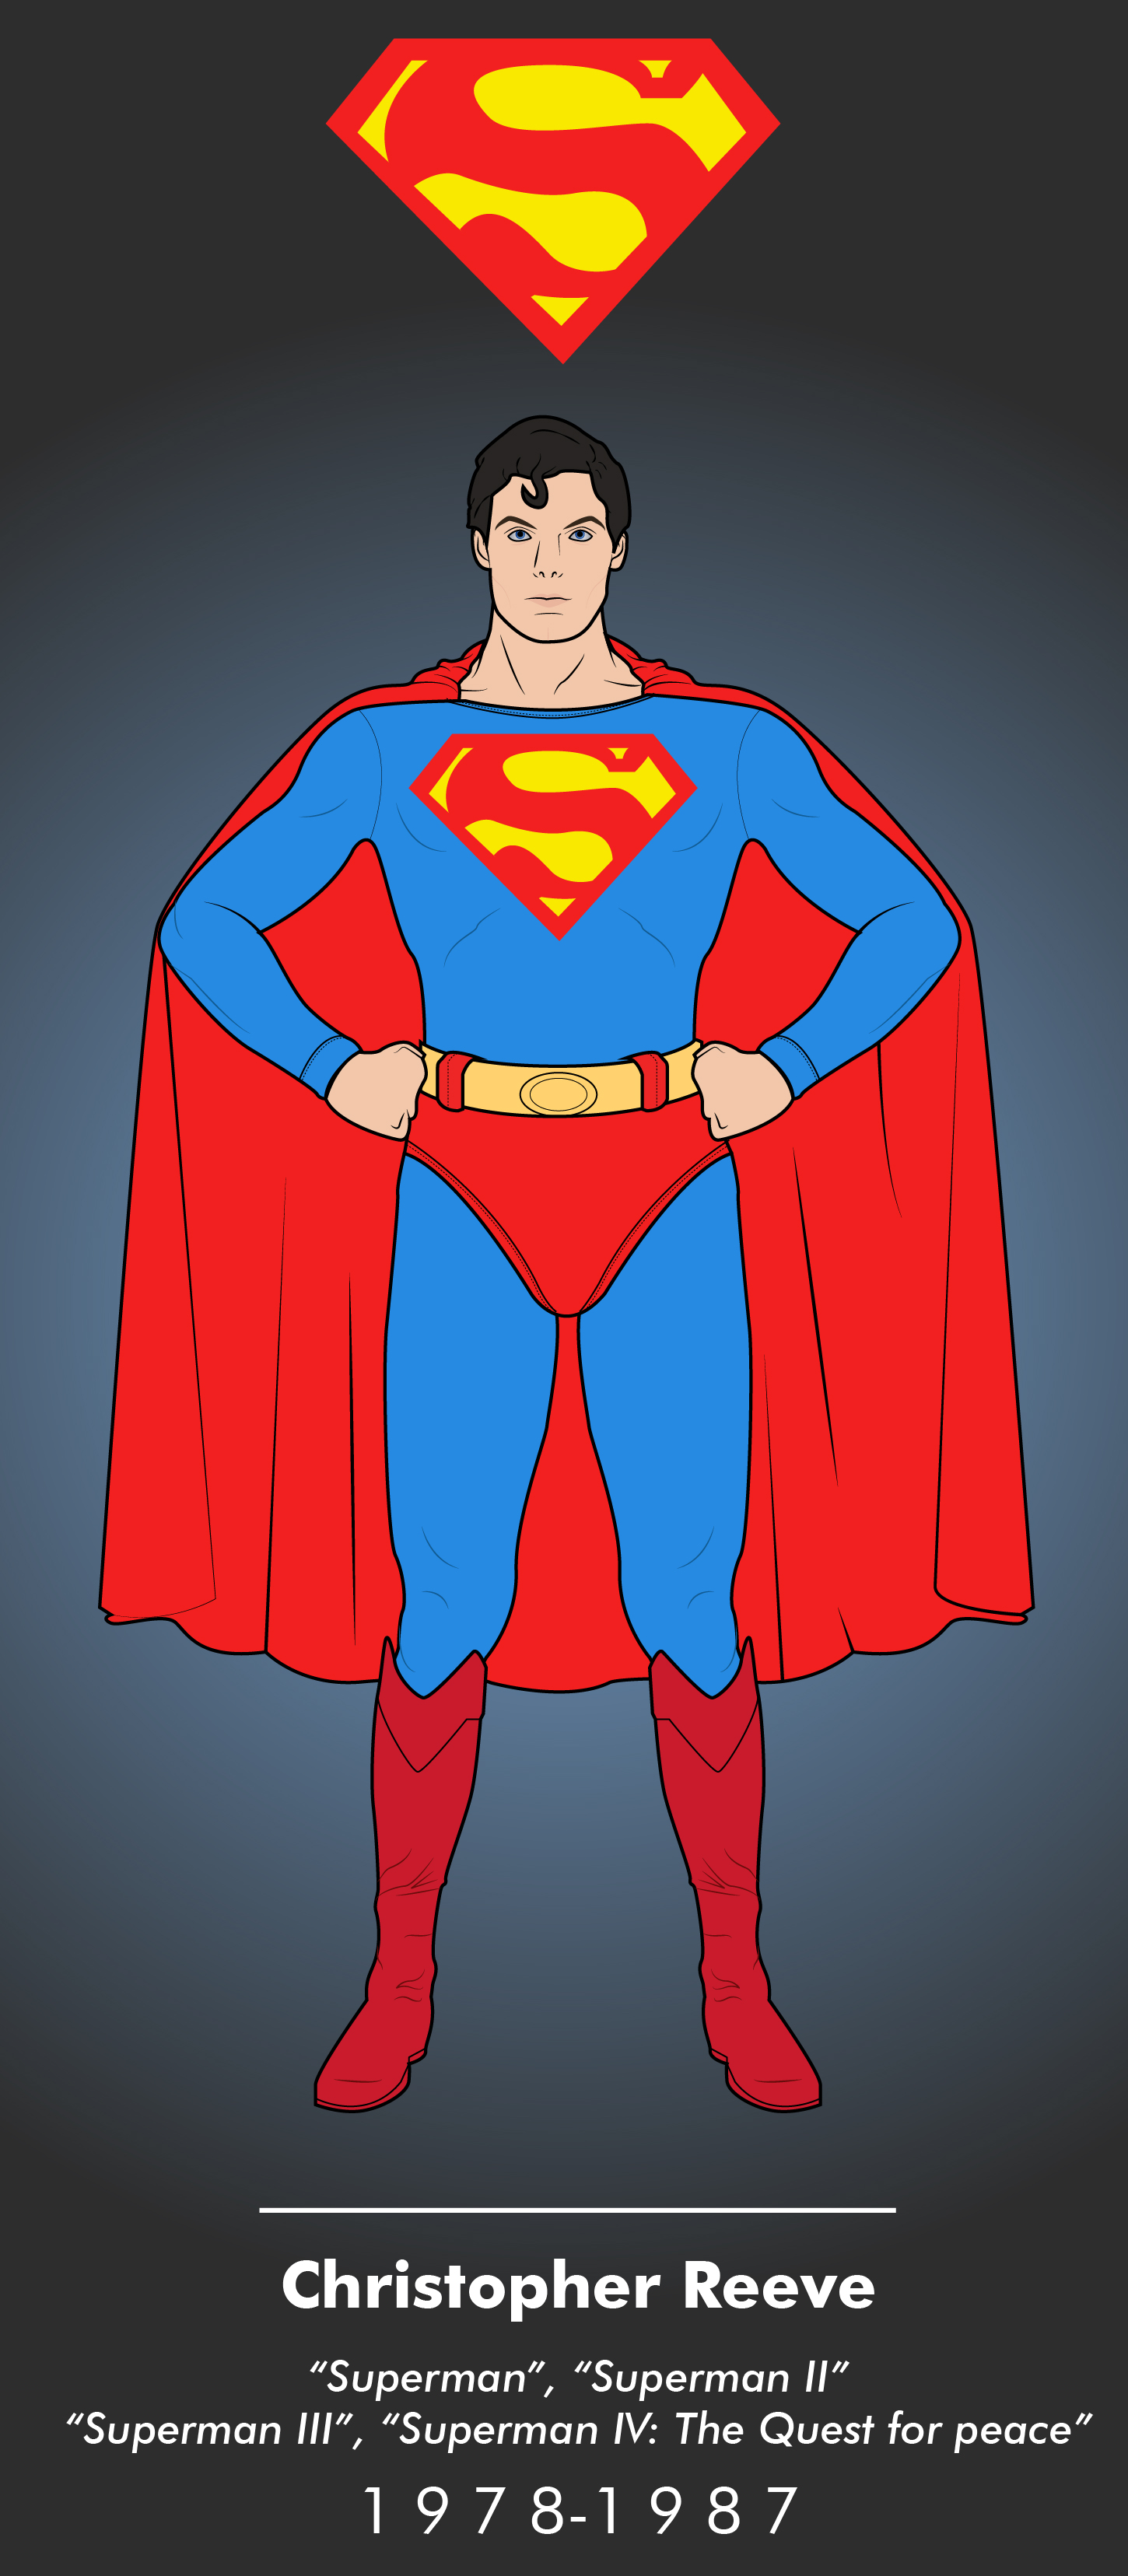 Superman 1978 1987 By Efrajoey1 On Deviantart